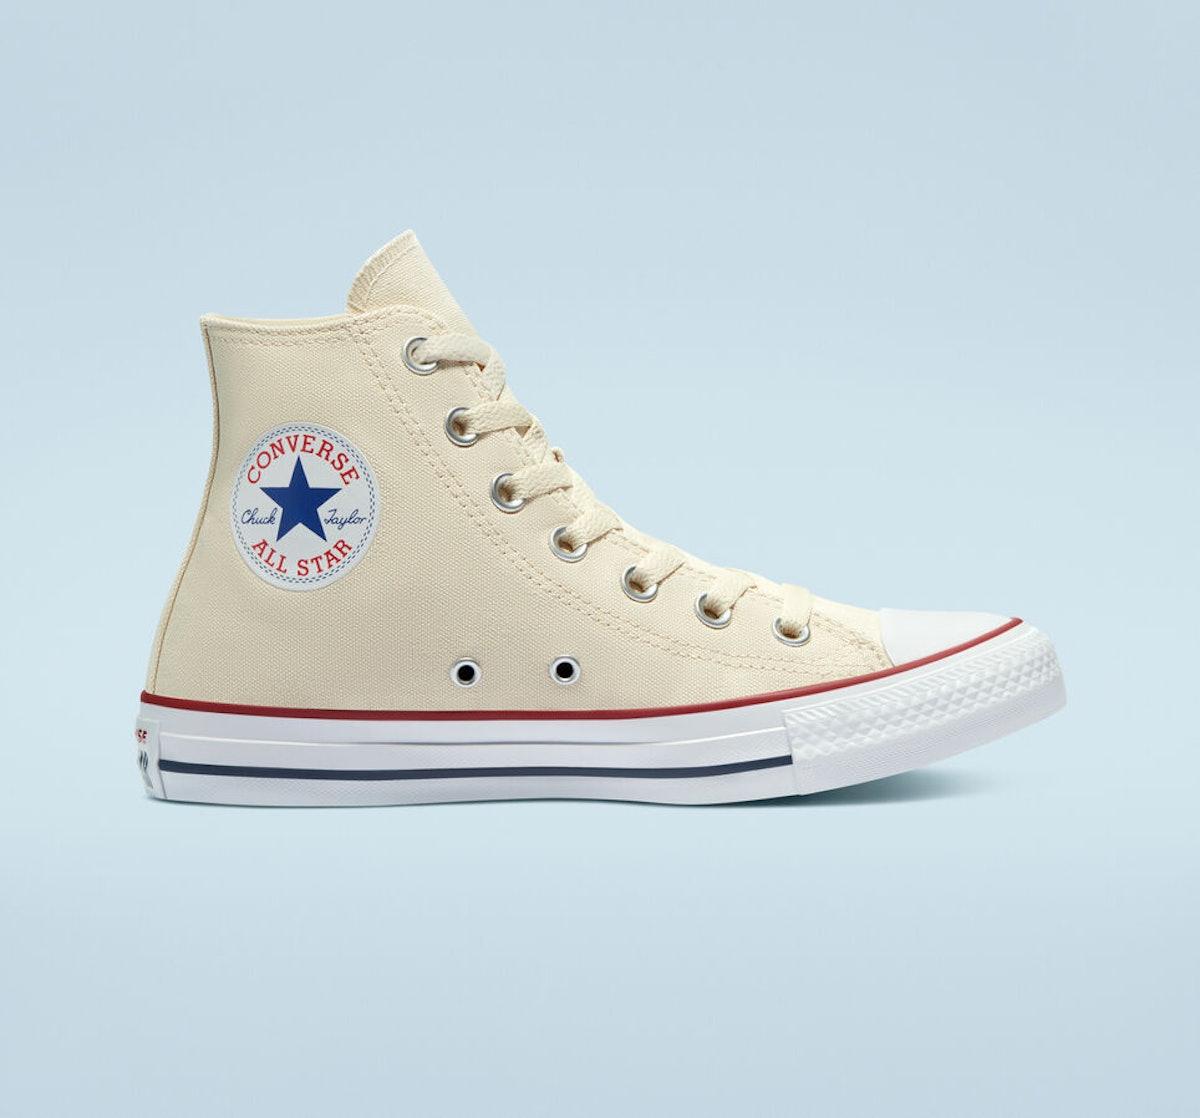 Off-white Converse chuck taylor